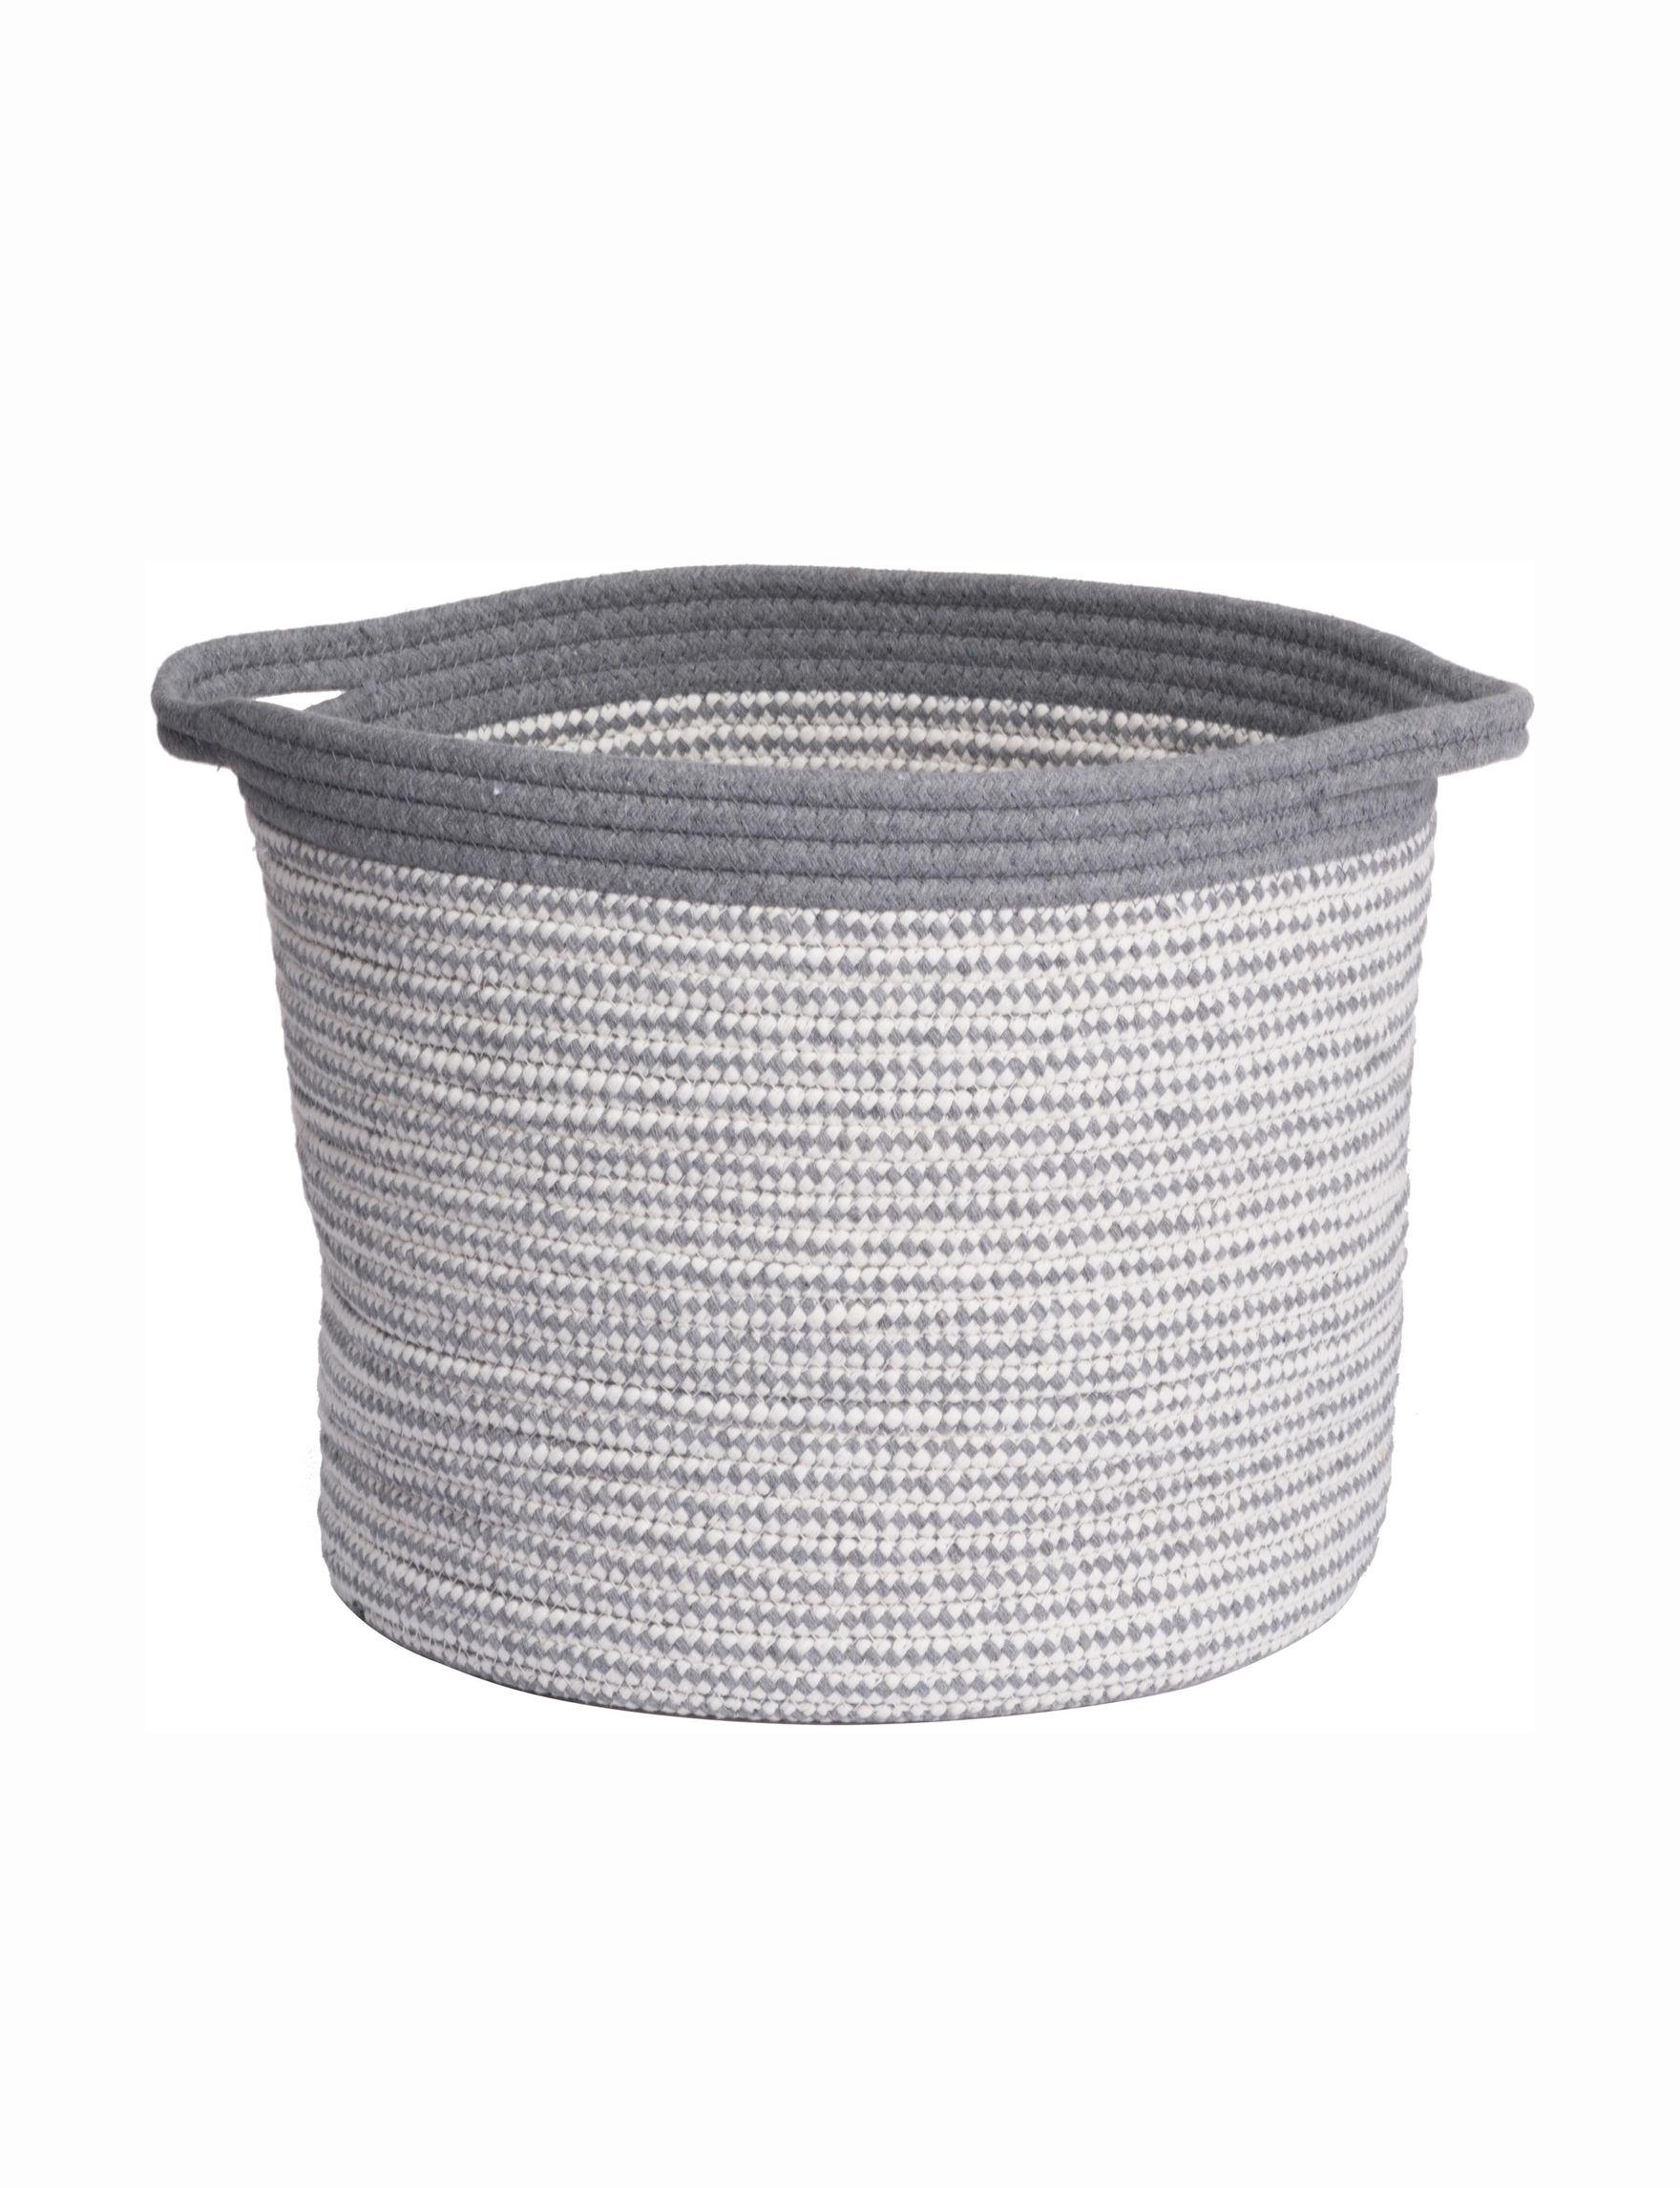 A&B Home Grey Baskets Storage & Organization